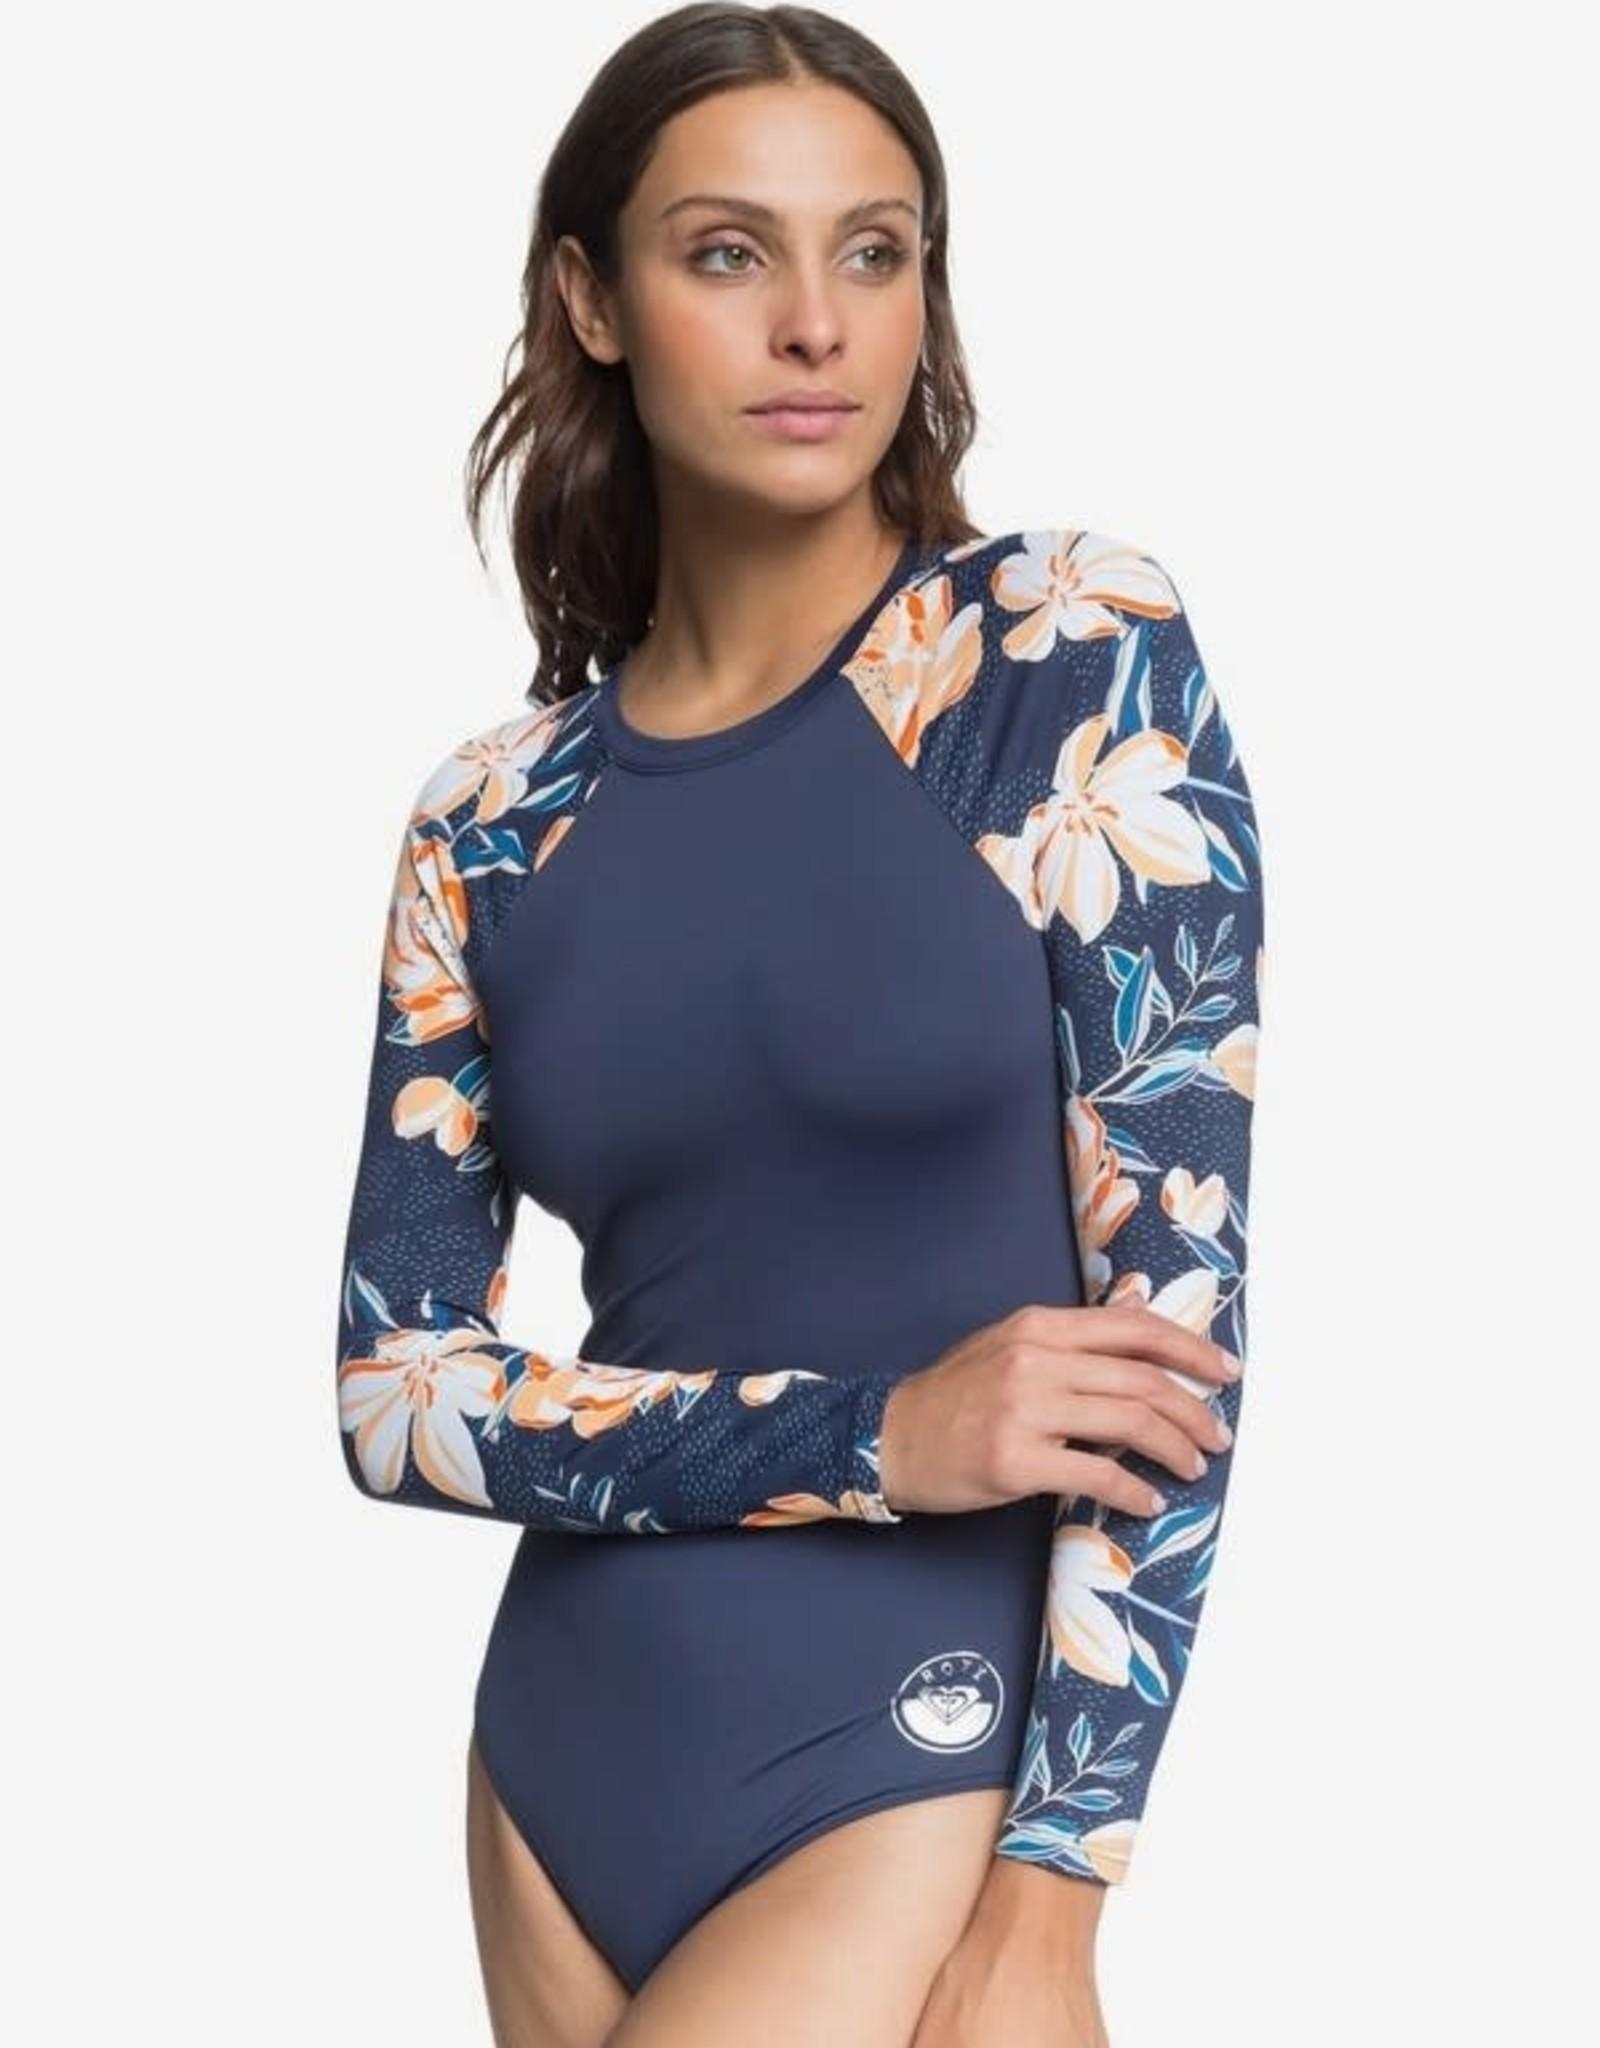 ROXY Lilies Surf Long Sleeve UPF 50 One-Piece Swimsuit